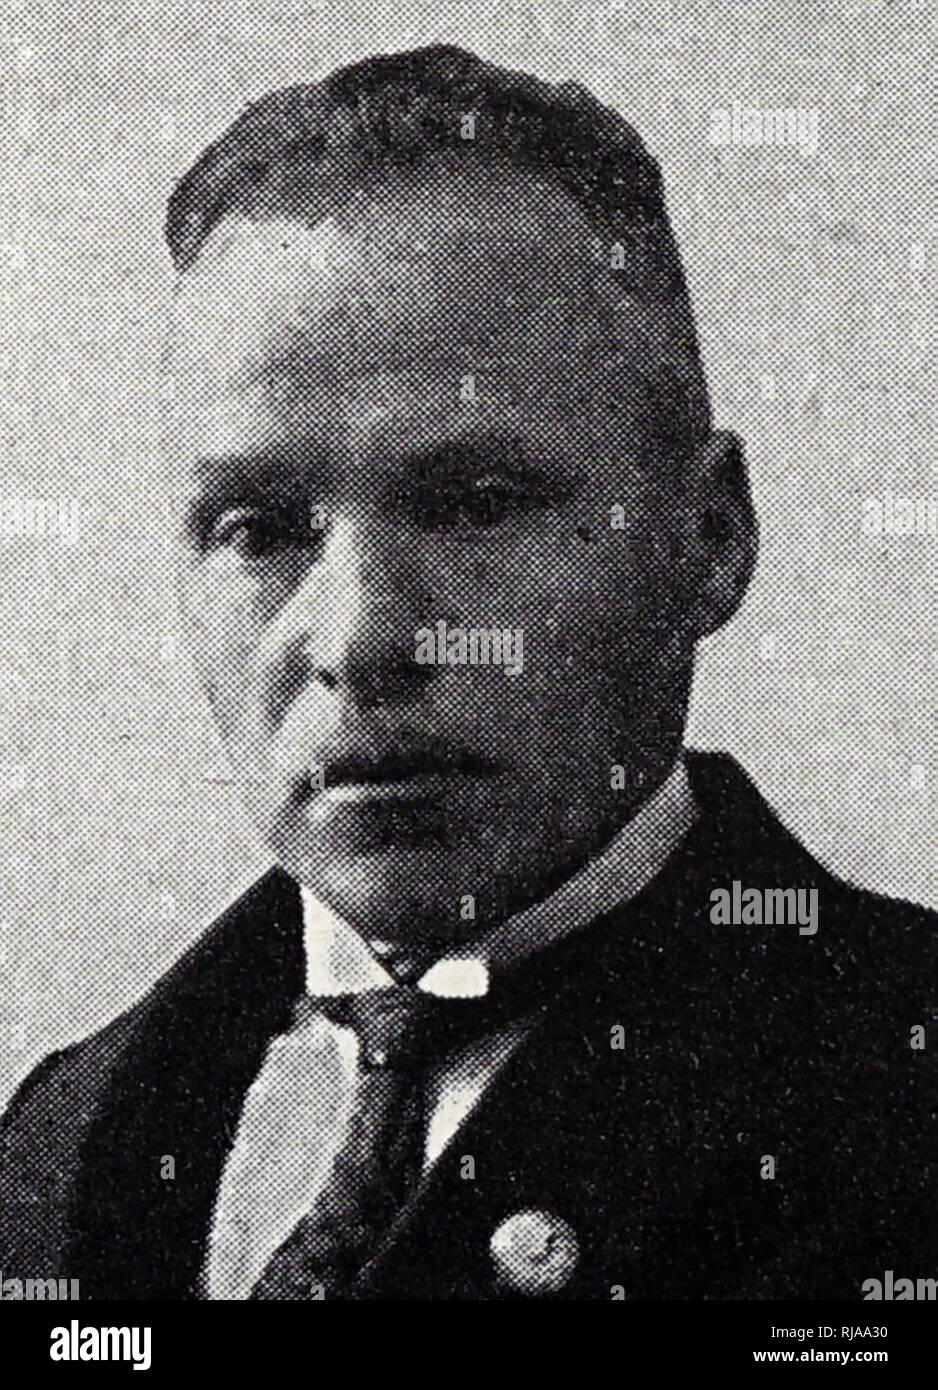 A. kampmann, Atletica Gazzetta, Tedesco sport olimpici gazzetta 1936 Giochi nazista a Berlino Immagini Stock